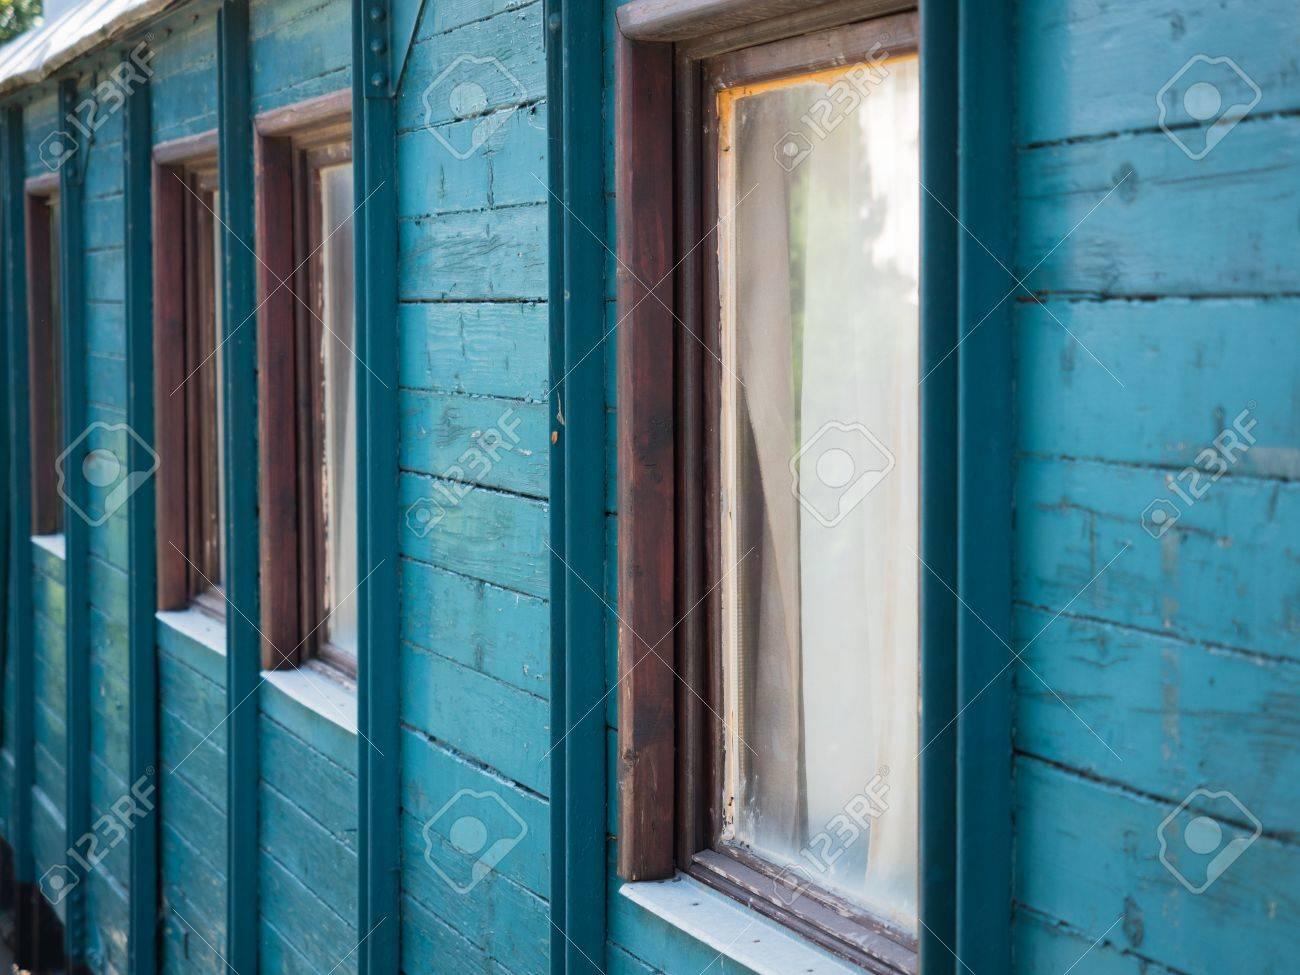 imagen de la pared de madera pintada de color azul turquesa con pintura antigua en